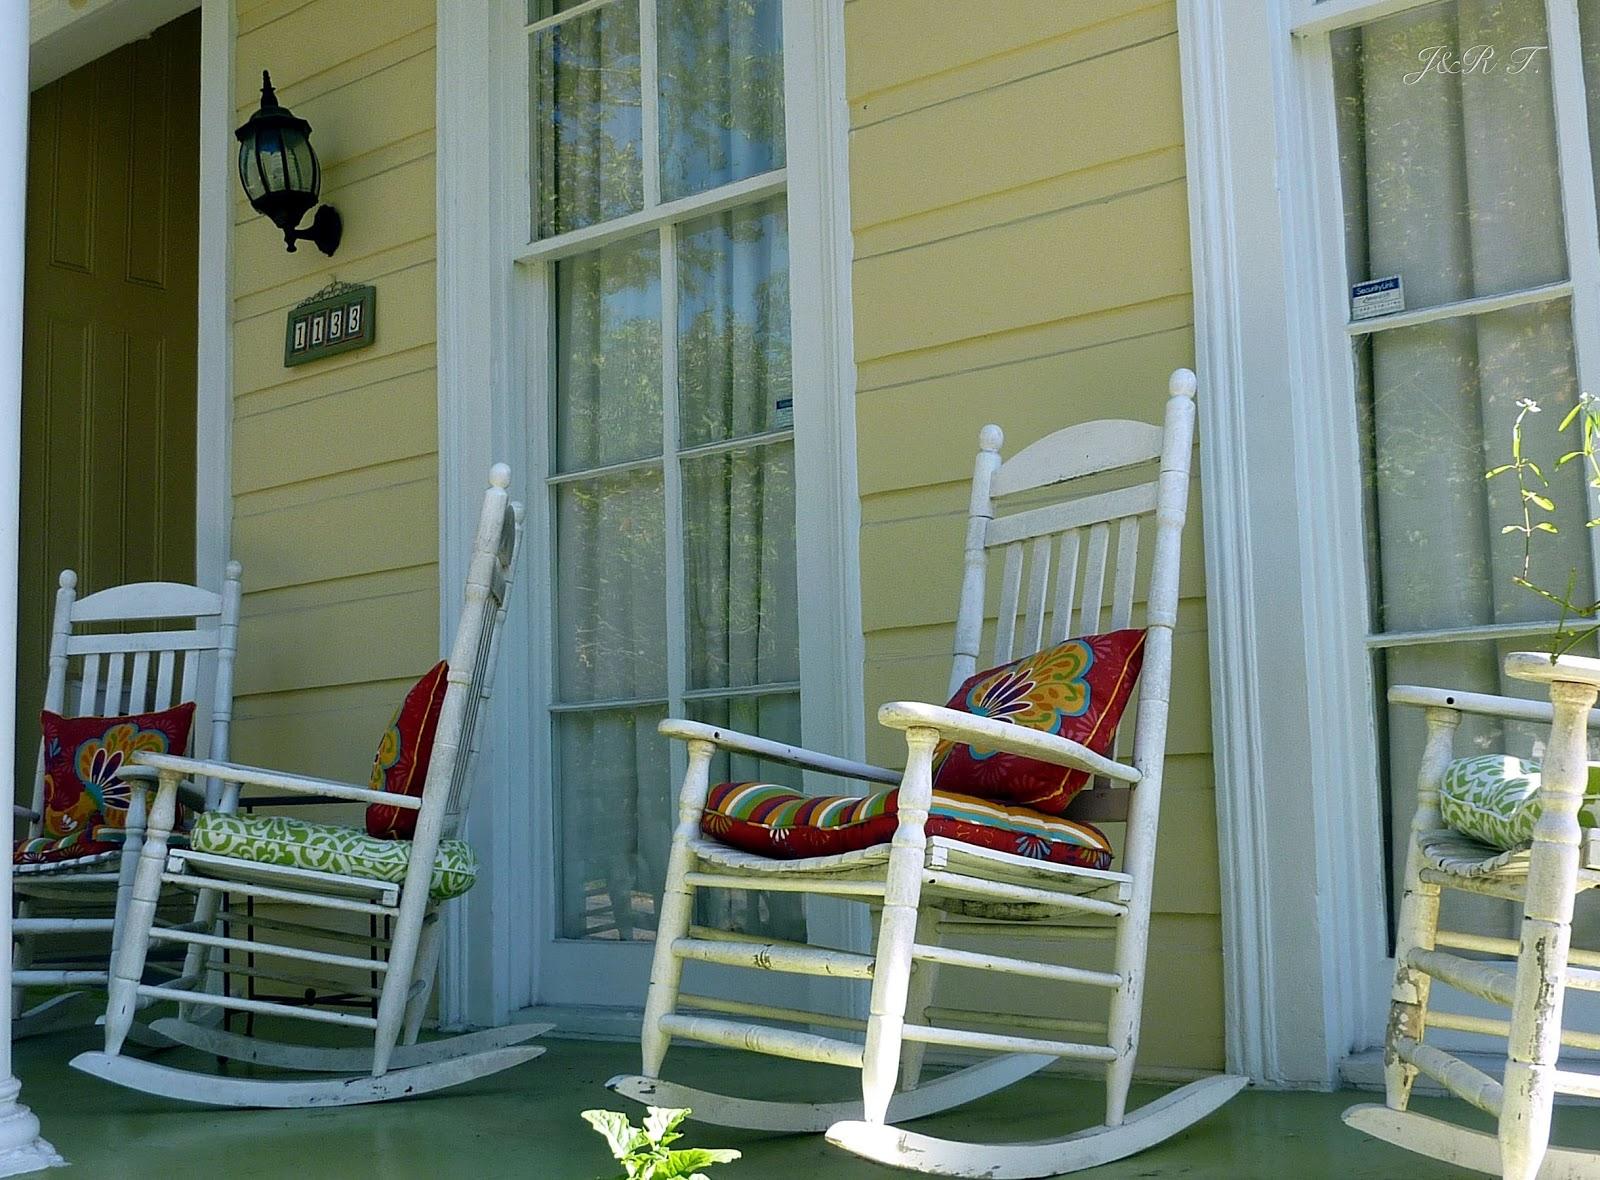 louisiane nouvelle orleans. Black Bedroom Furniture Sets. Home Design Ideas